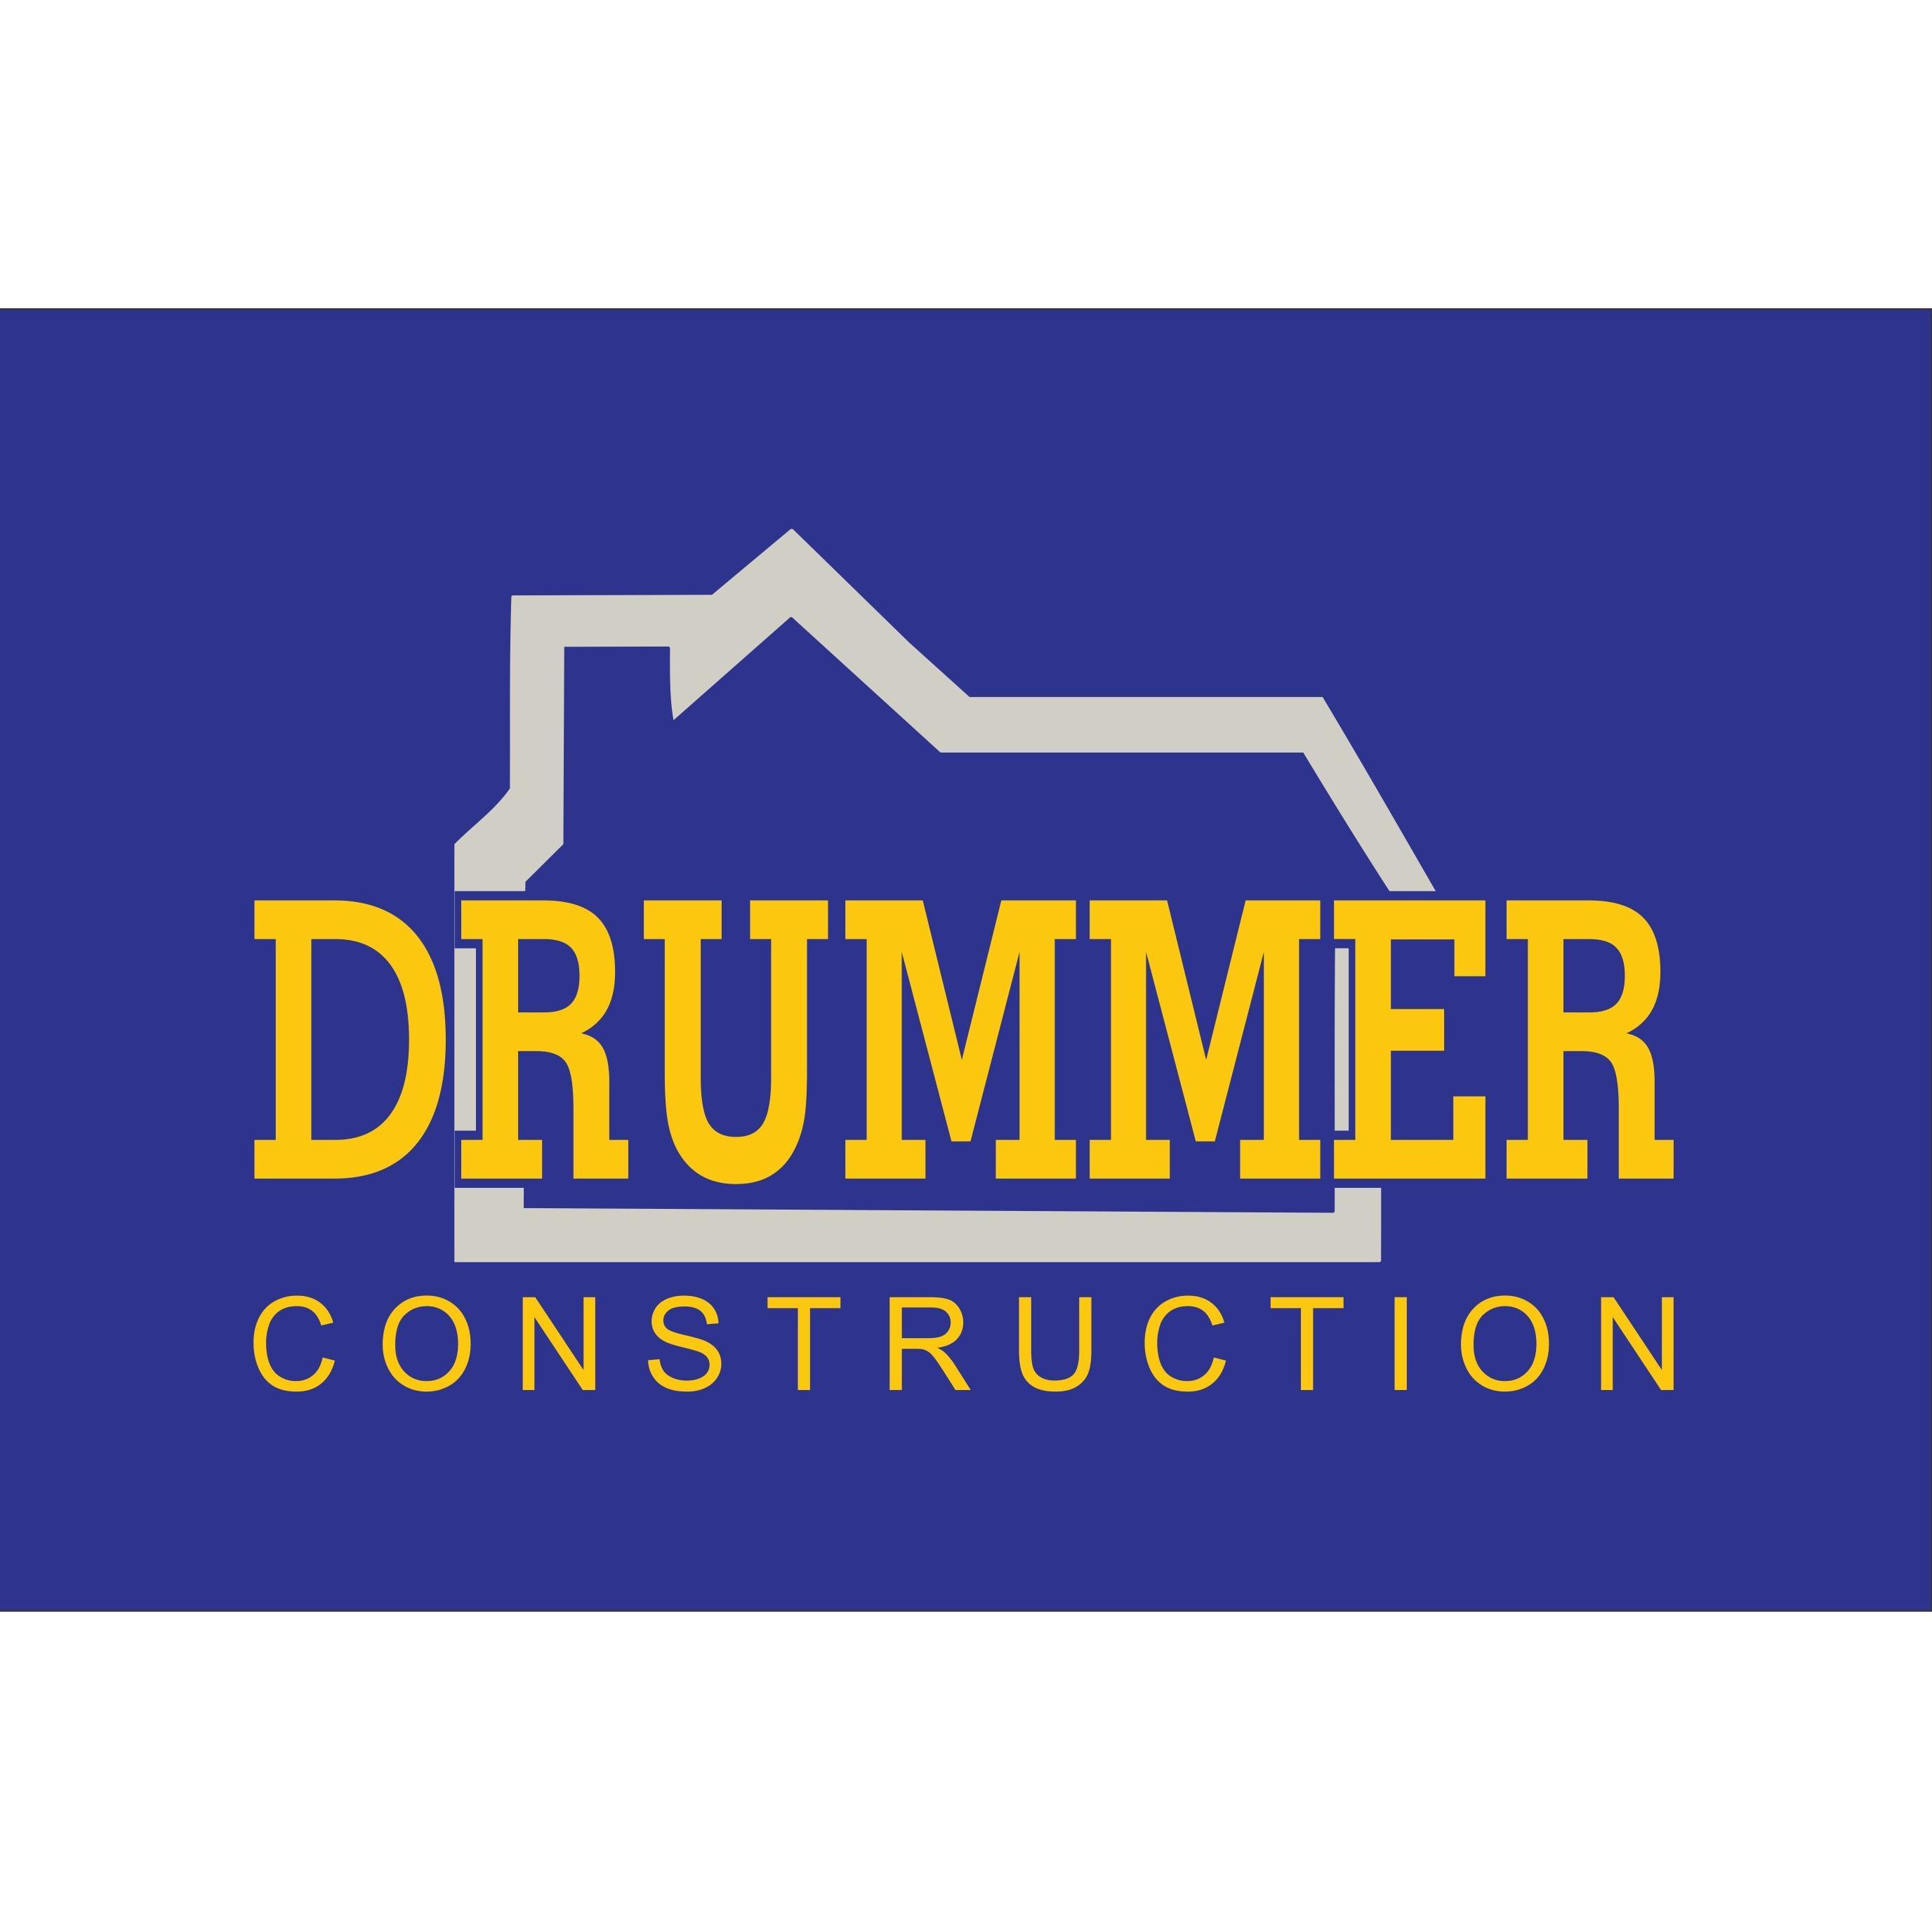 Drummer Construction - Centreville, MD - Landscape Architects & Design